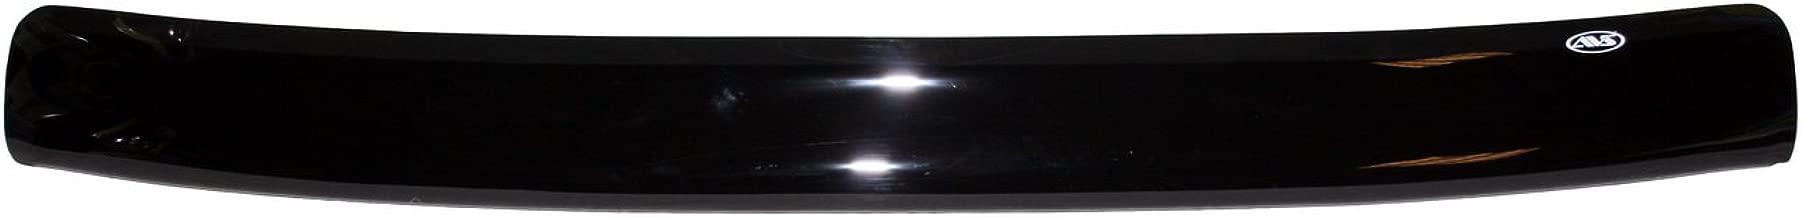 Auto Ventshade 23438 Bugflector Dark Smoke Hood Shield for 1991-1997 Toyota Land Cruiser